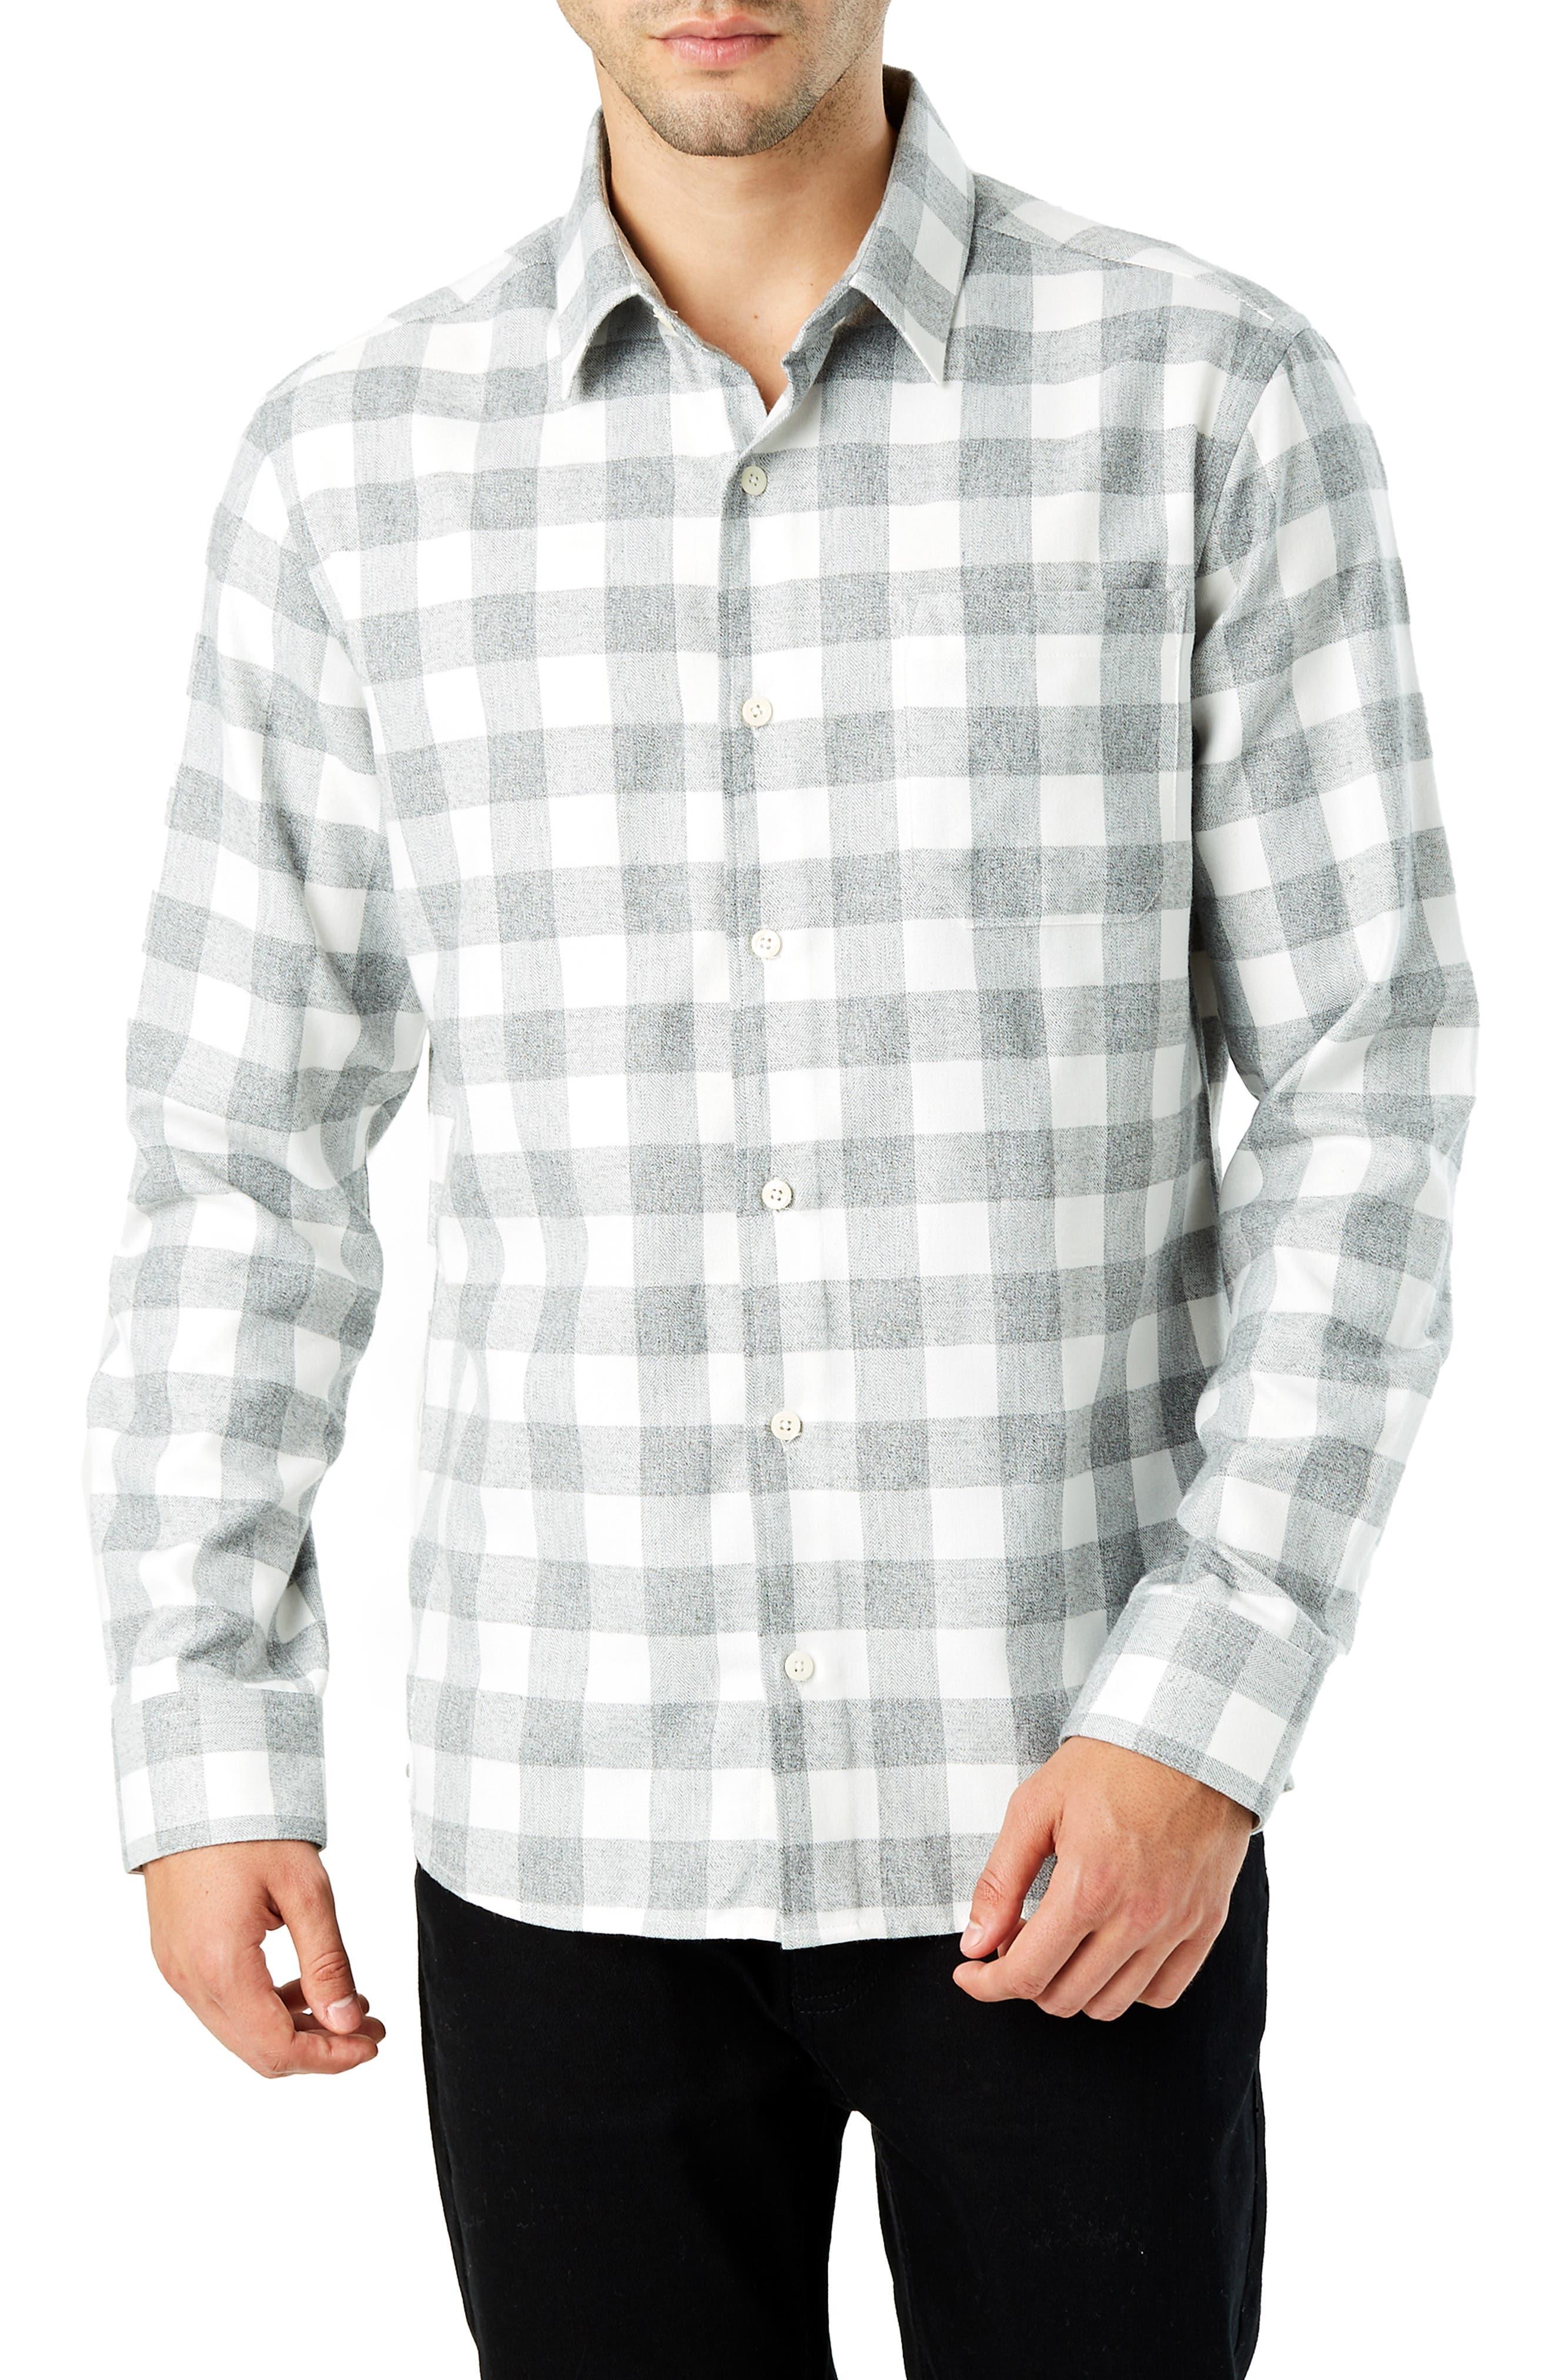 Sparrow Trim Fit Flannel Shirt,                             Main thumbnail 1, color,                             GREY WHITE